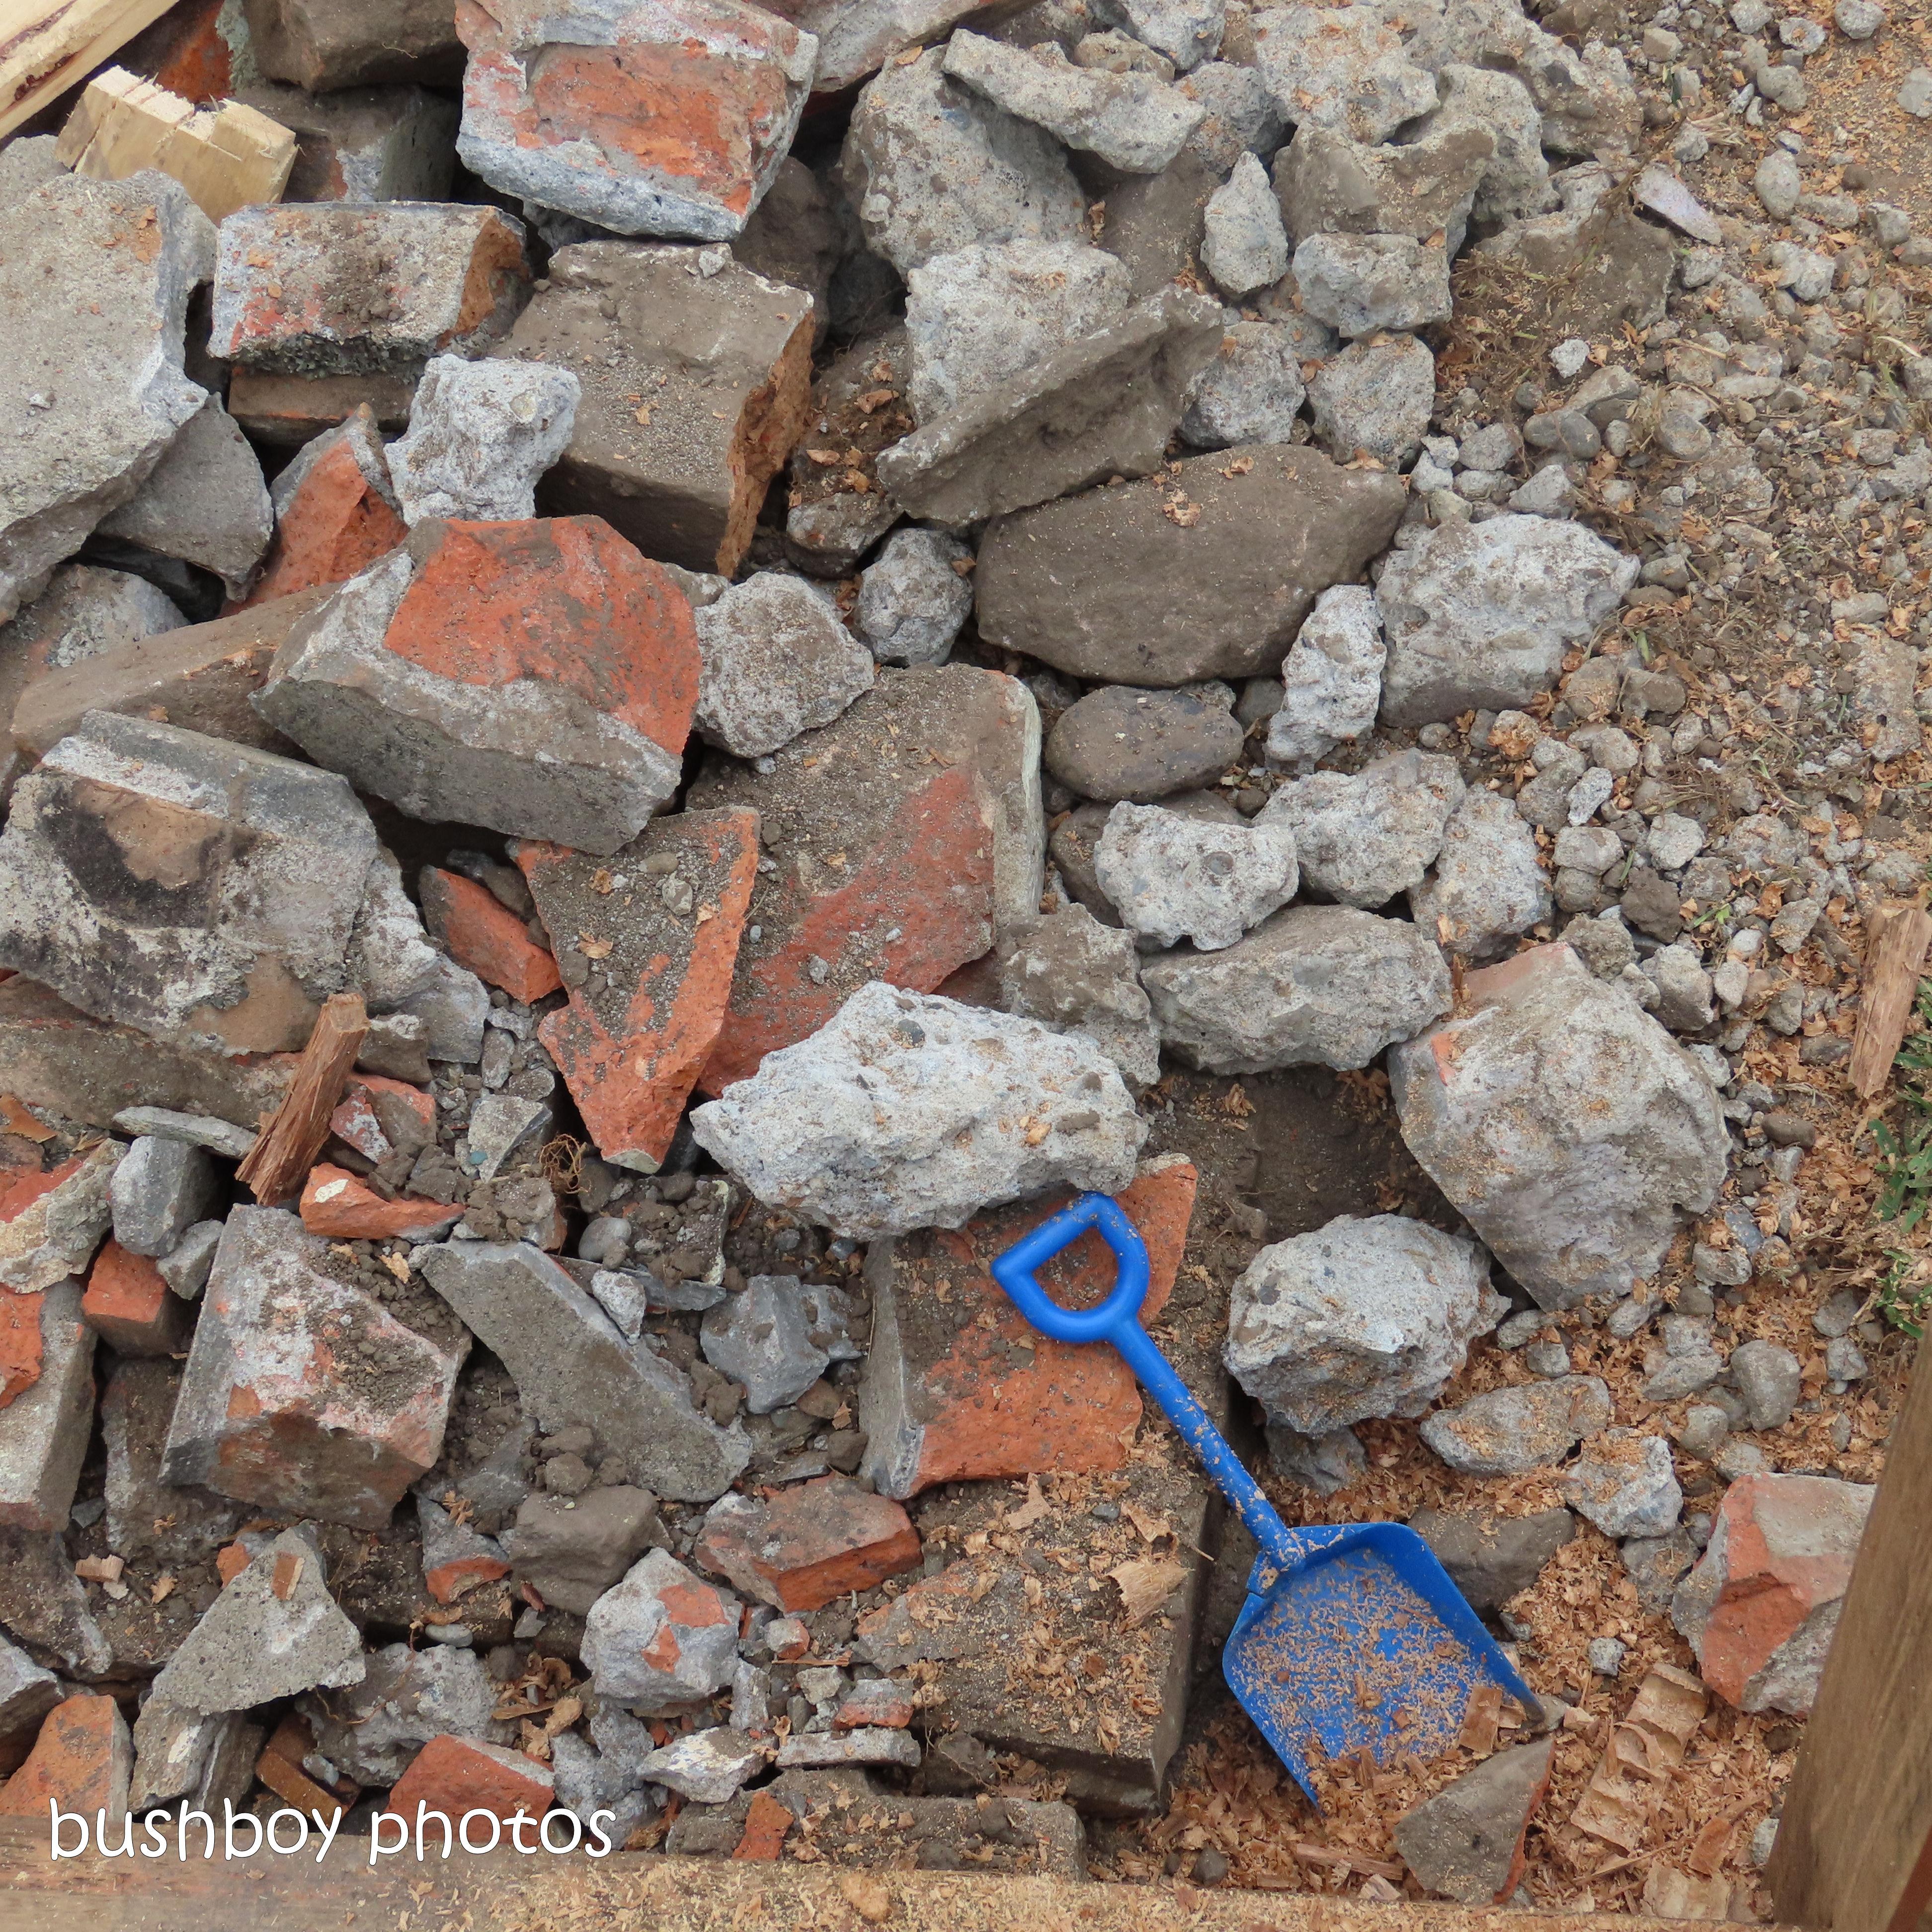 20200326_6_blog challenge_diary_bricks_shovel_toy_grafton